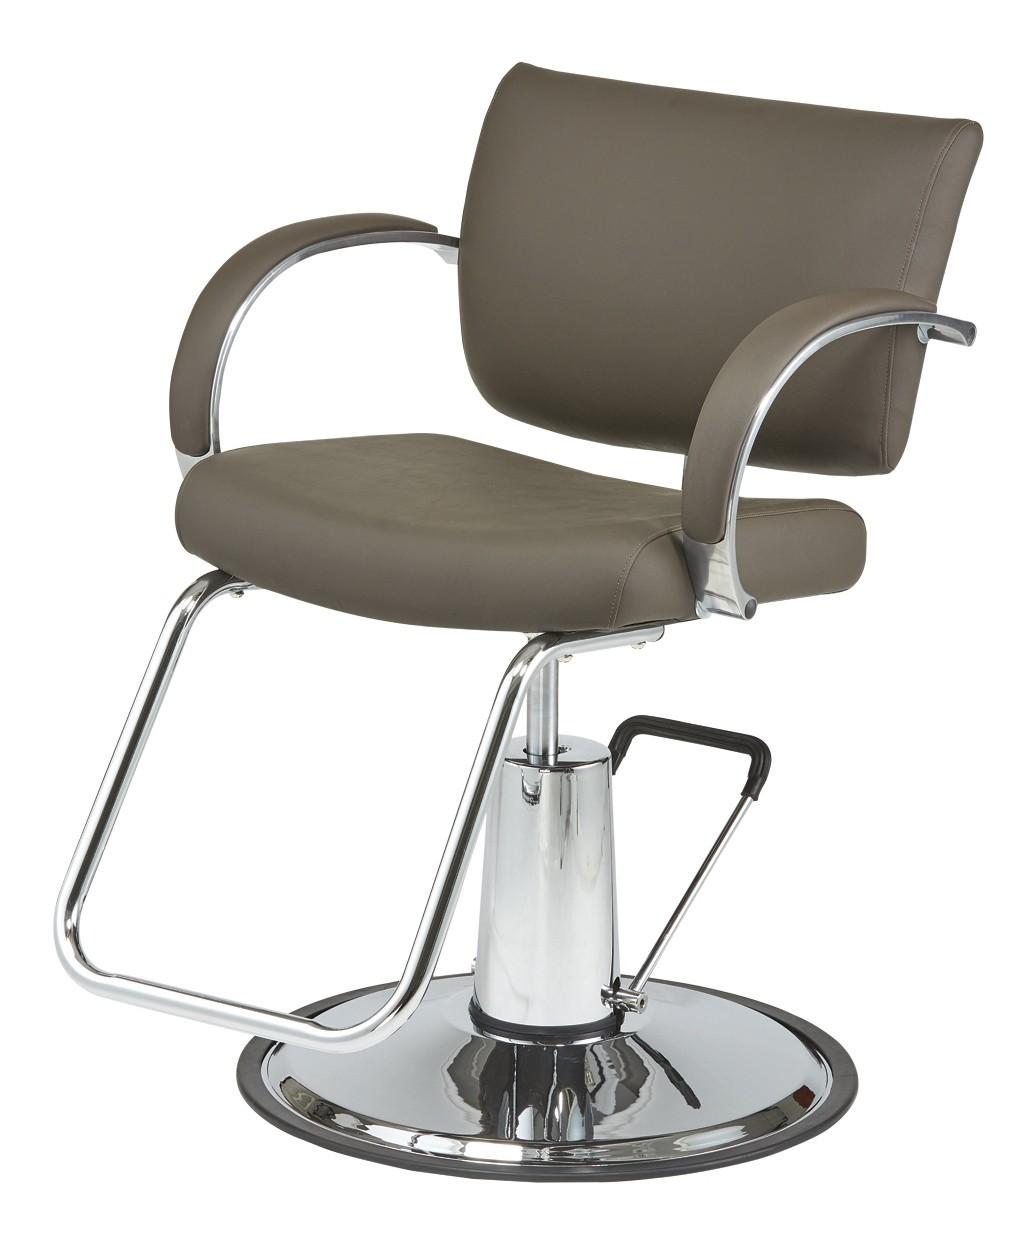 Pibbs 3206 Ragusa Styling Chair